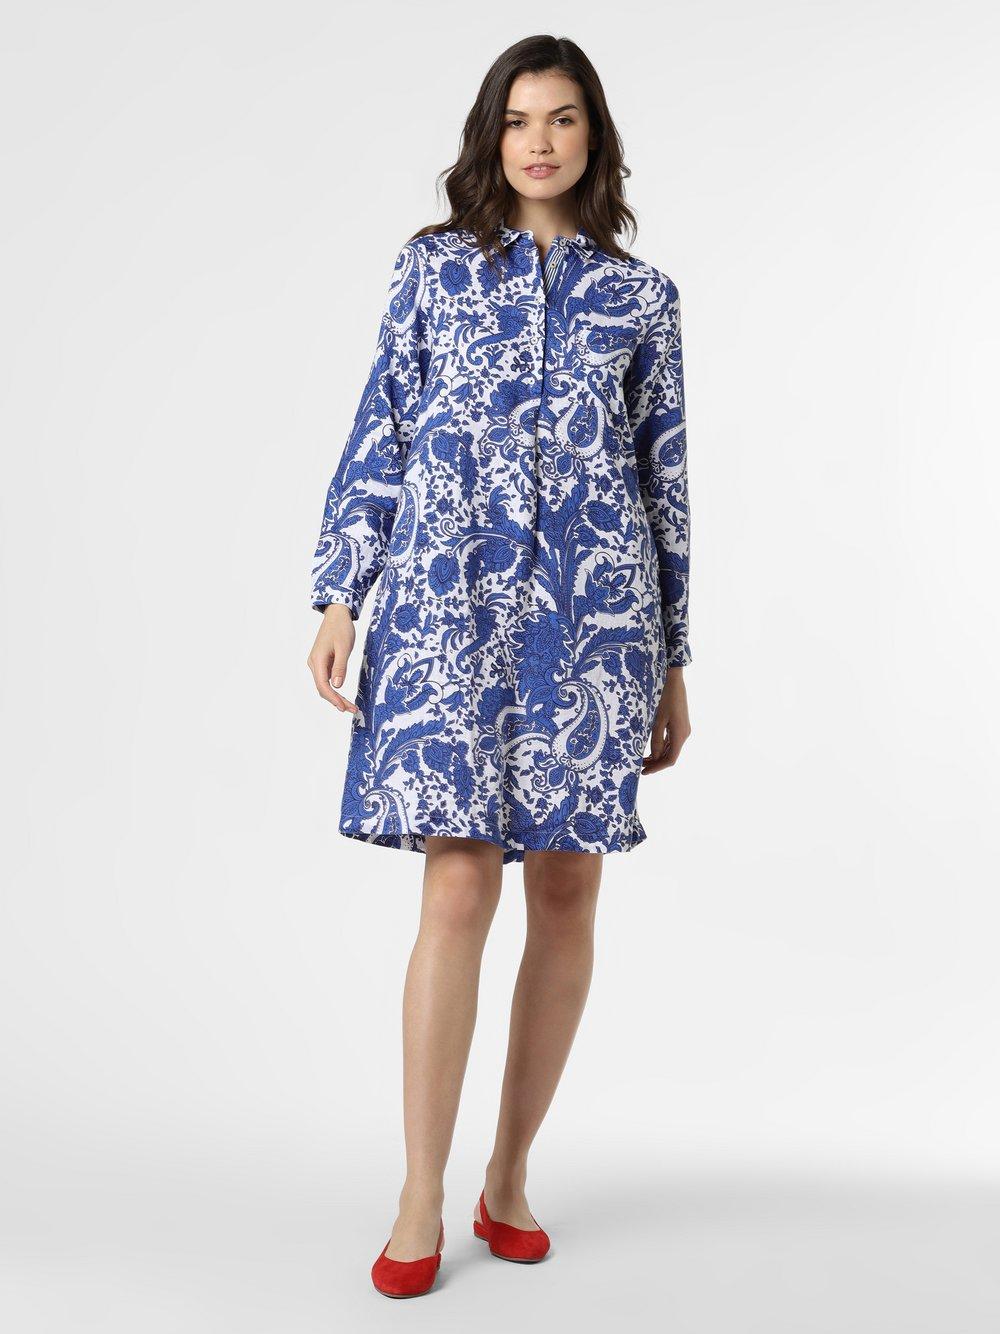 Emily van den Bergh - Damska sukienka lniana, niebieski